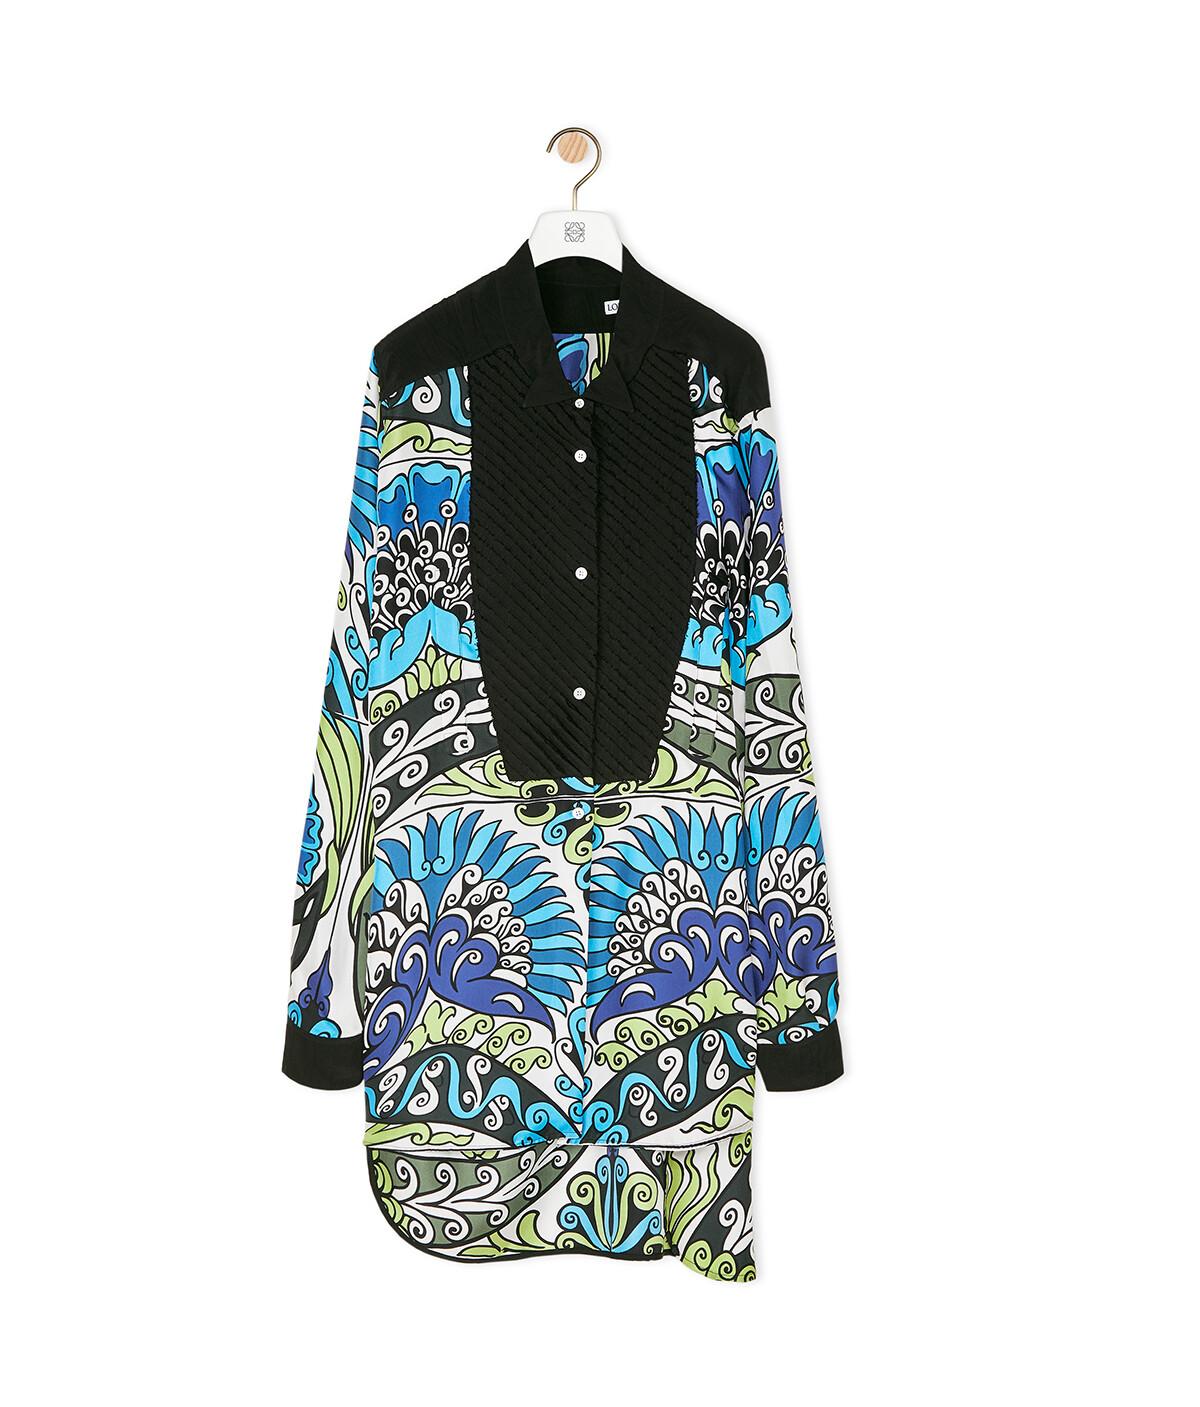 LOEWE Asymetrical Shirt Azul/Verde/Negro front